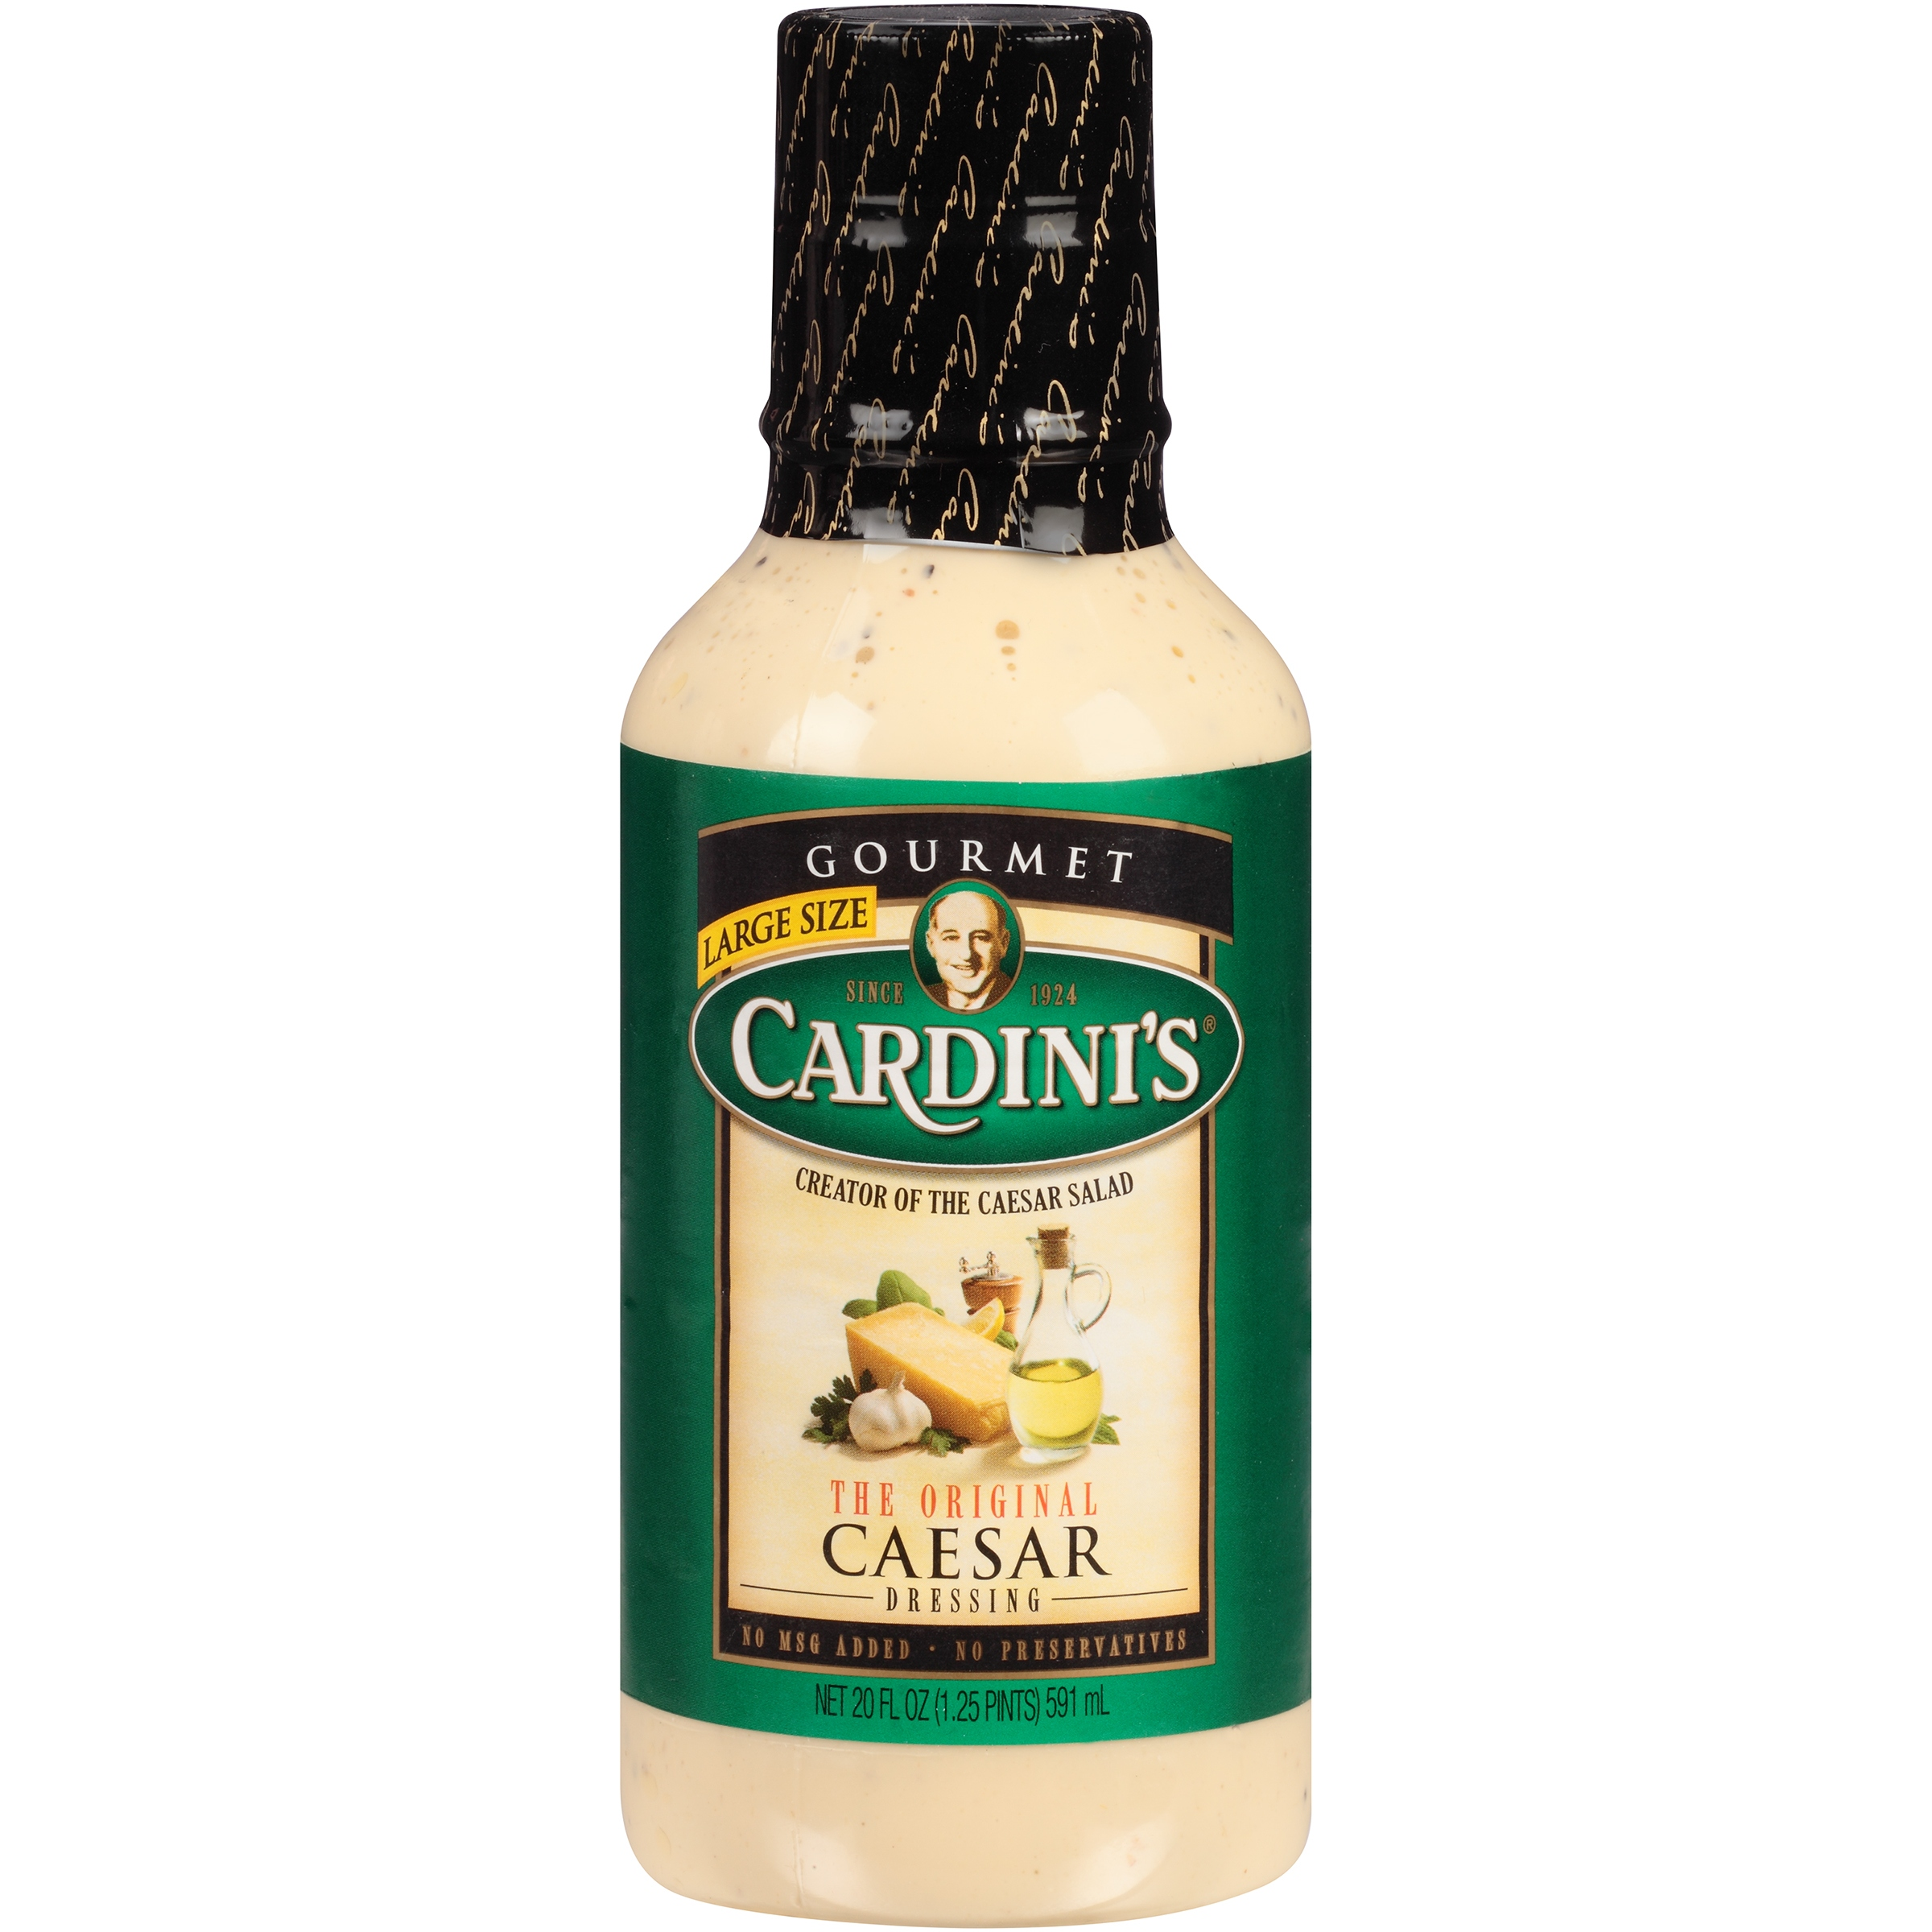 Cardini's® The Original Caesar Dressing 20 fl. oz. Bottle